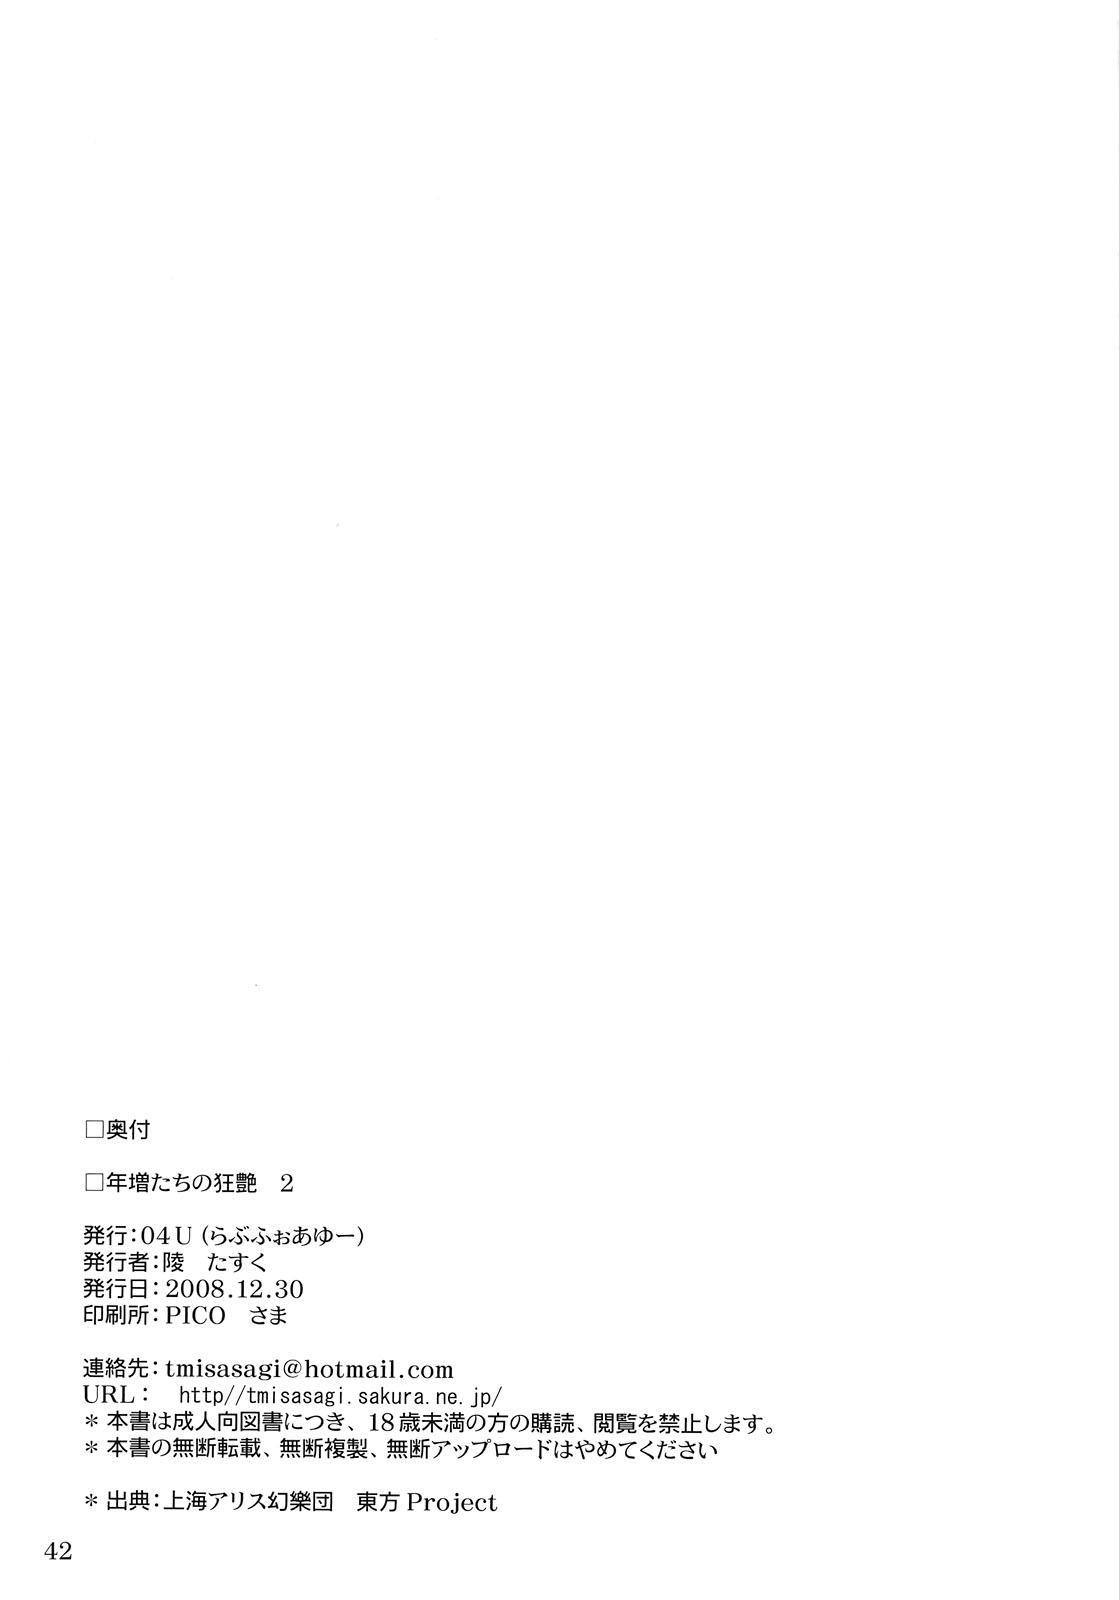 Toshima-tachi no Kyouen 2 41